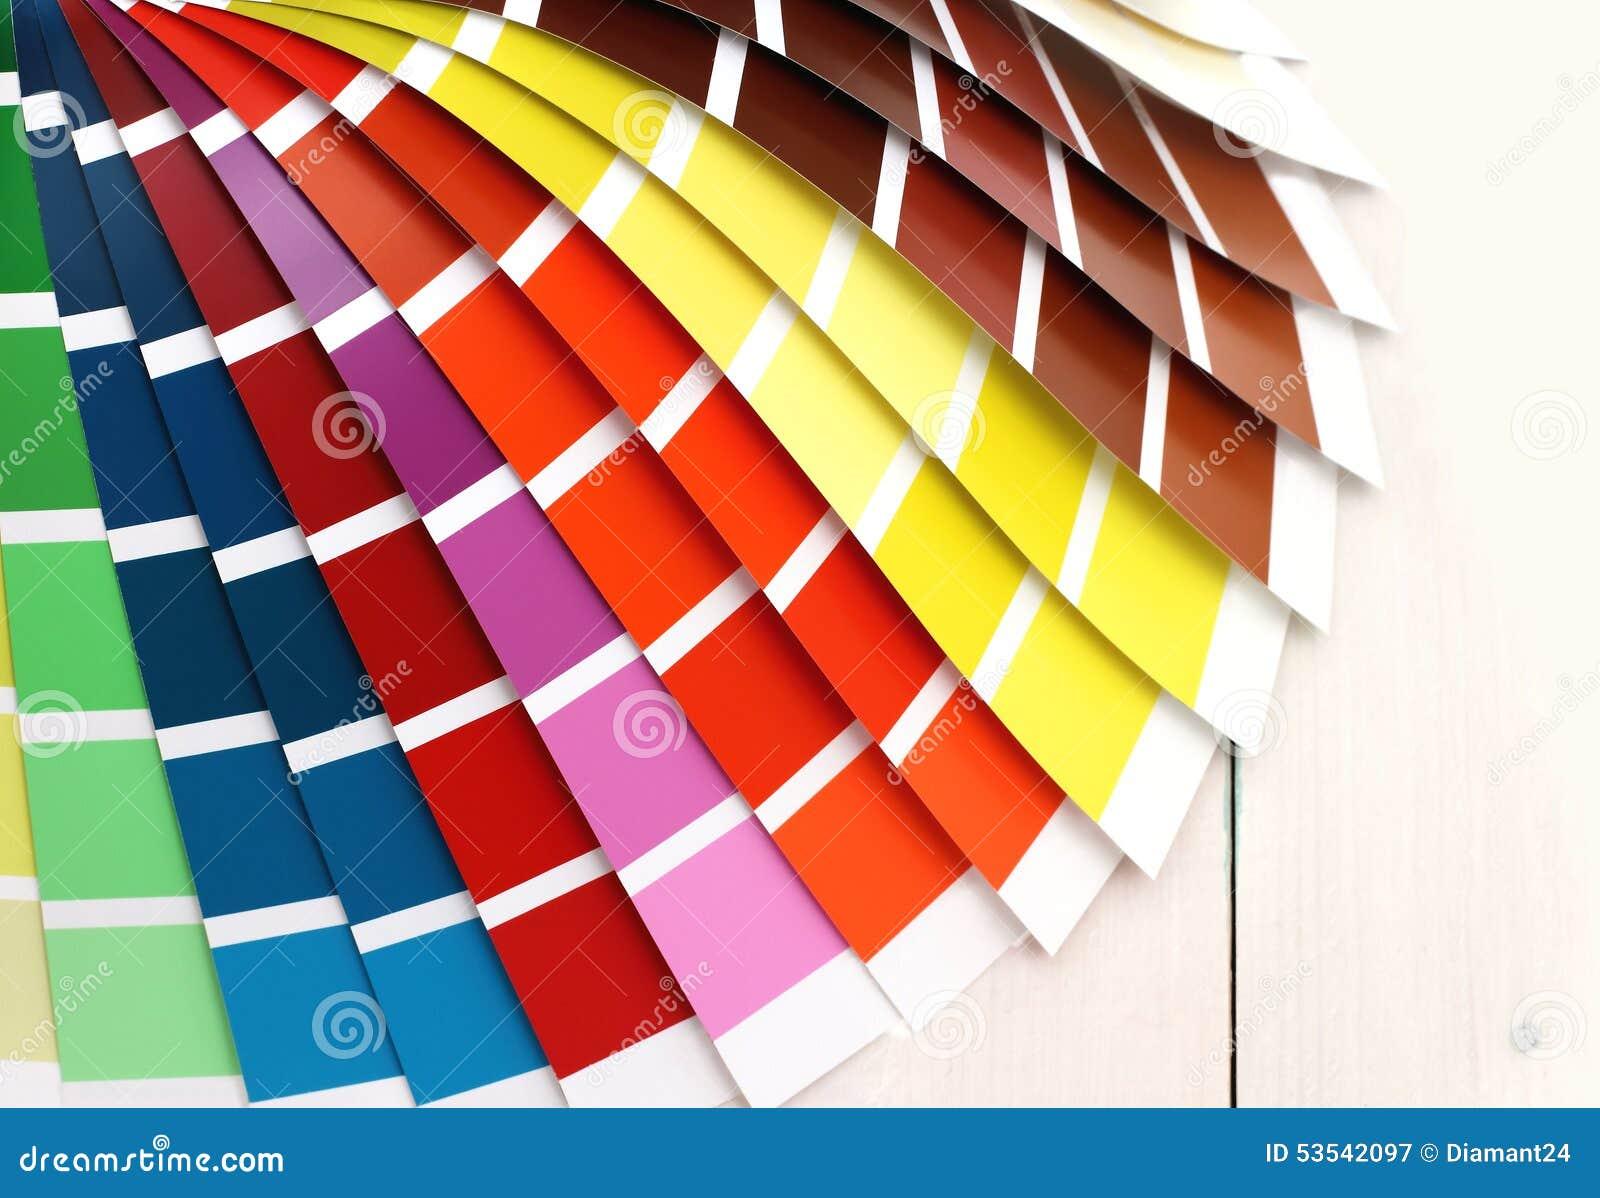 Moderno Libros De Color Pantone Para Ilustrador Adorno - Dibujos ...